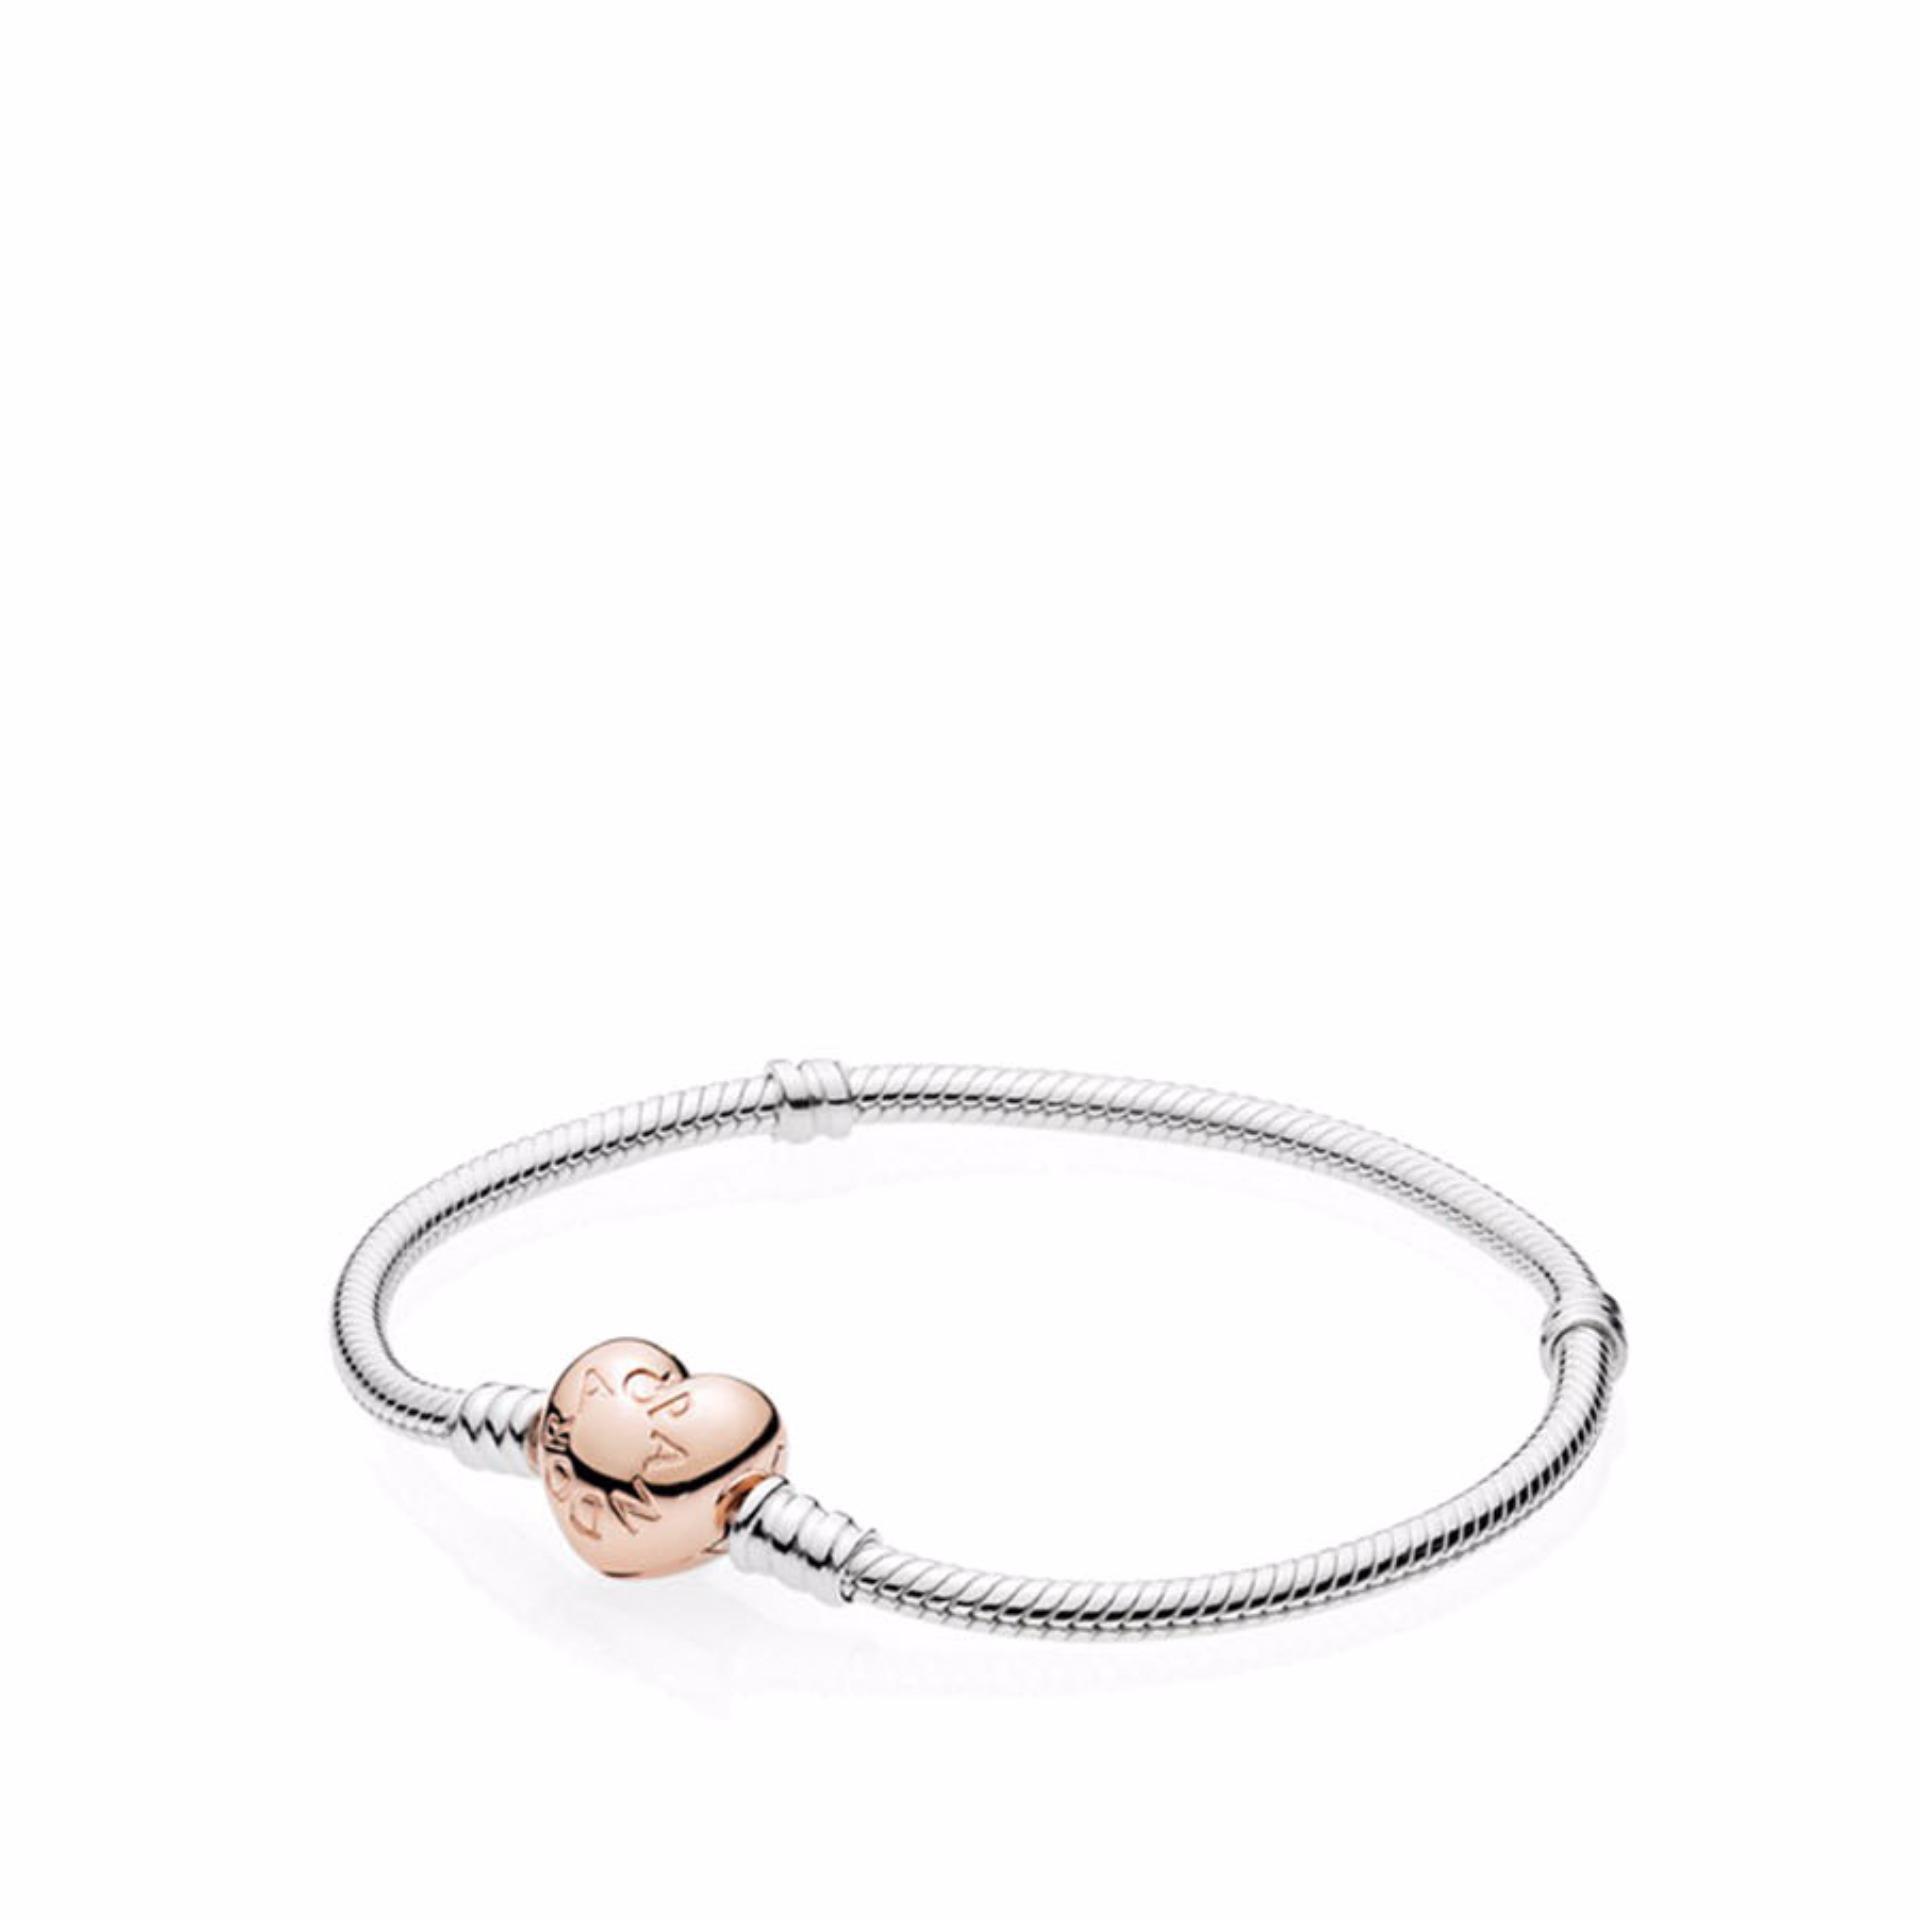 4b8063eae ... australia pandora silver bracelet with heart shaped pandora rose clasp  18 silver lazada indonesia 9006b 03933